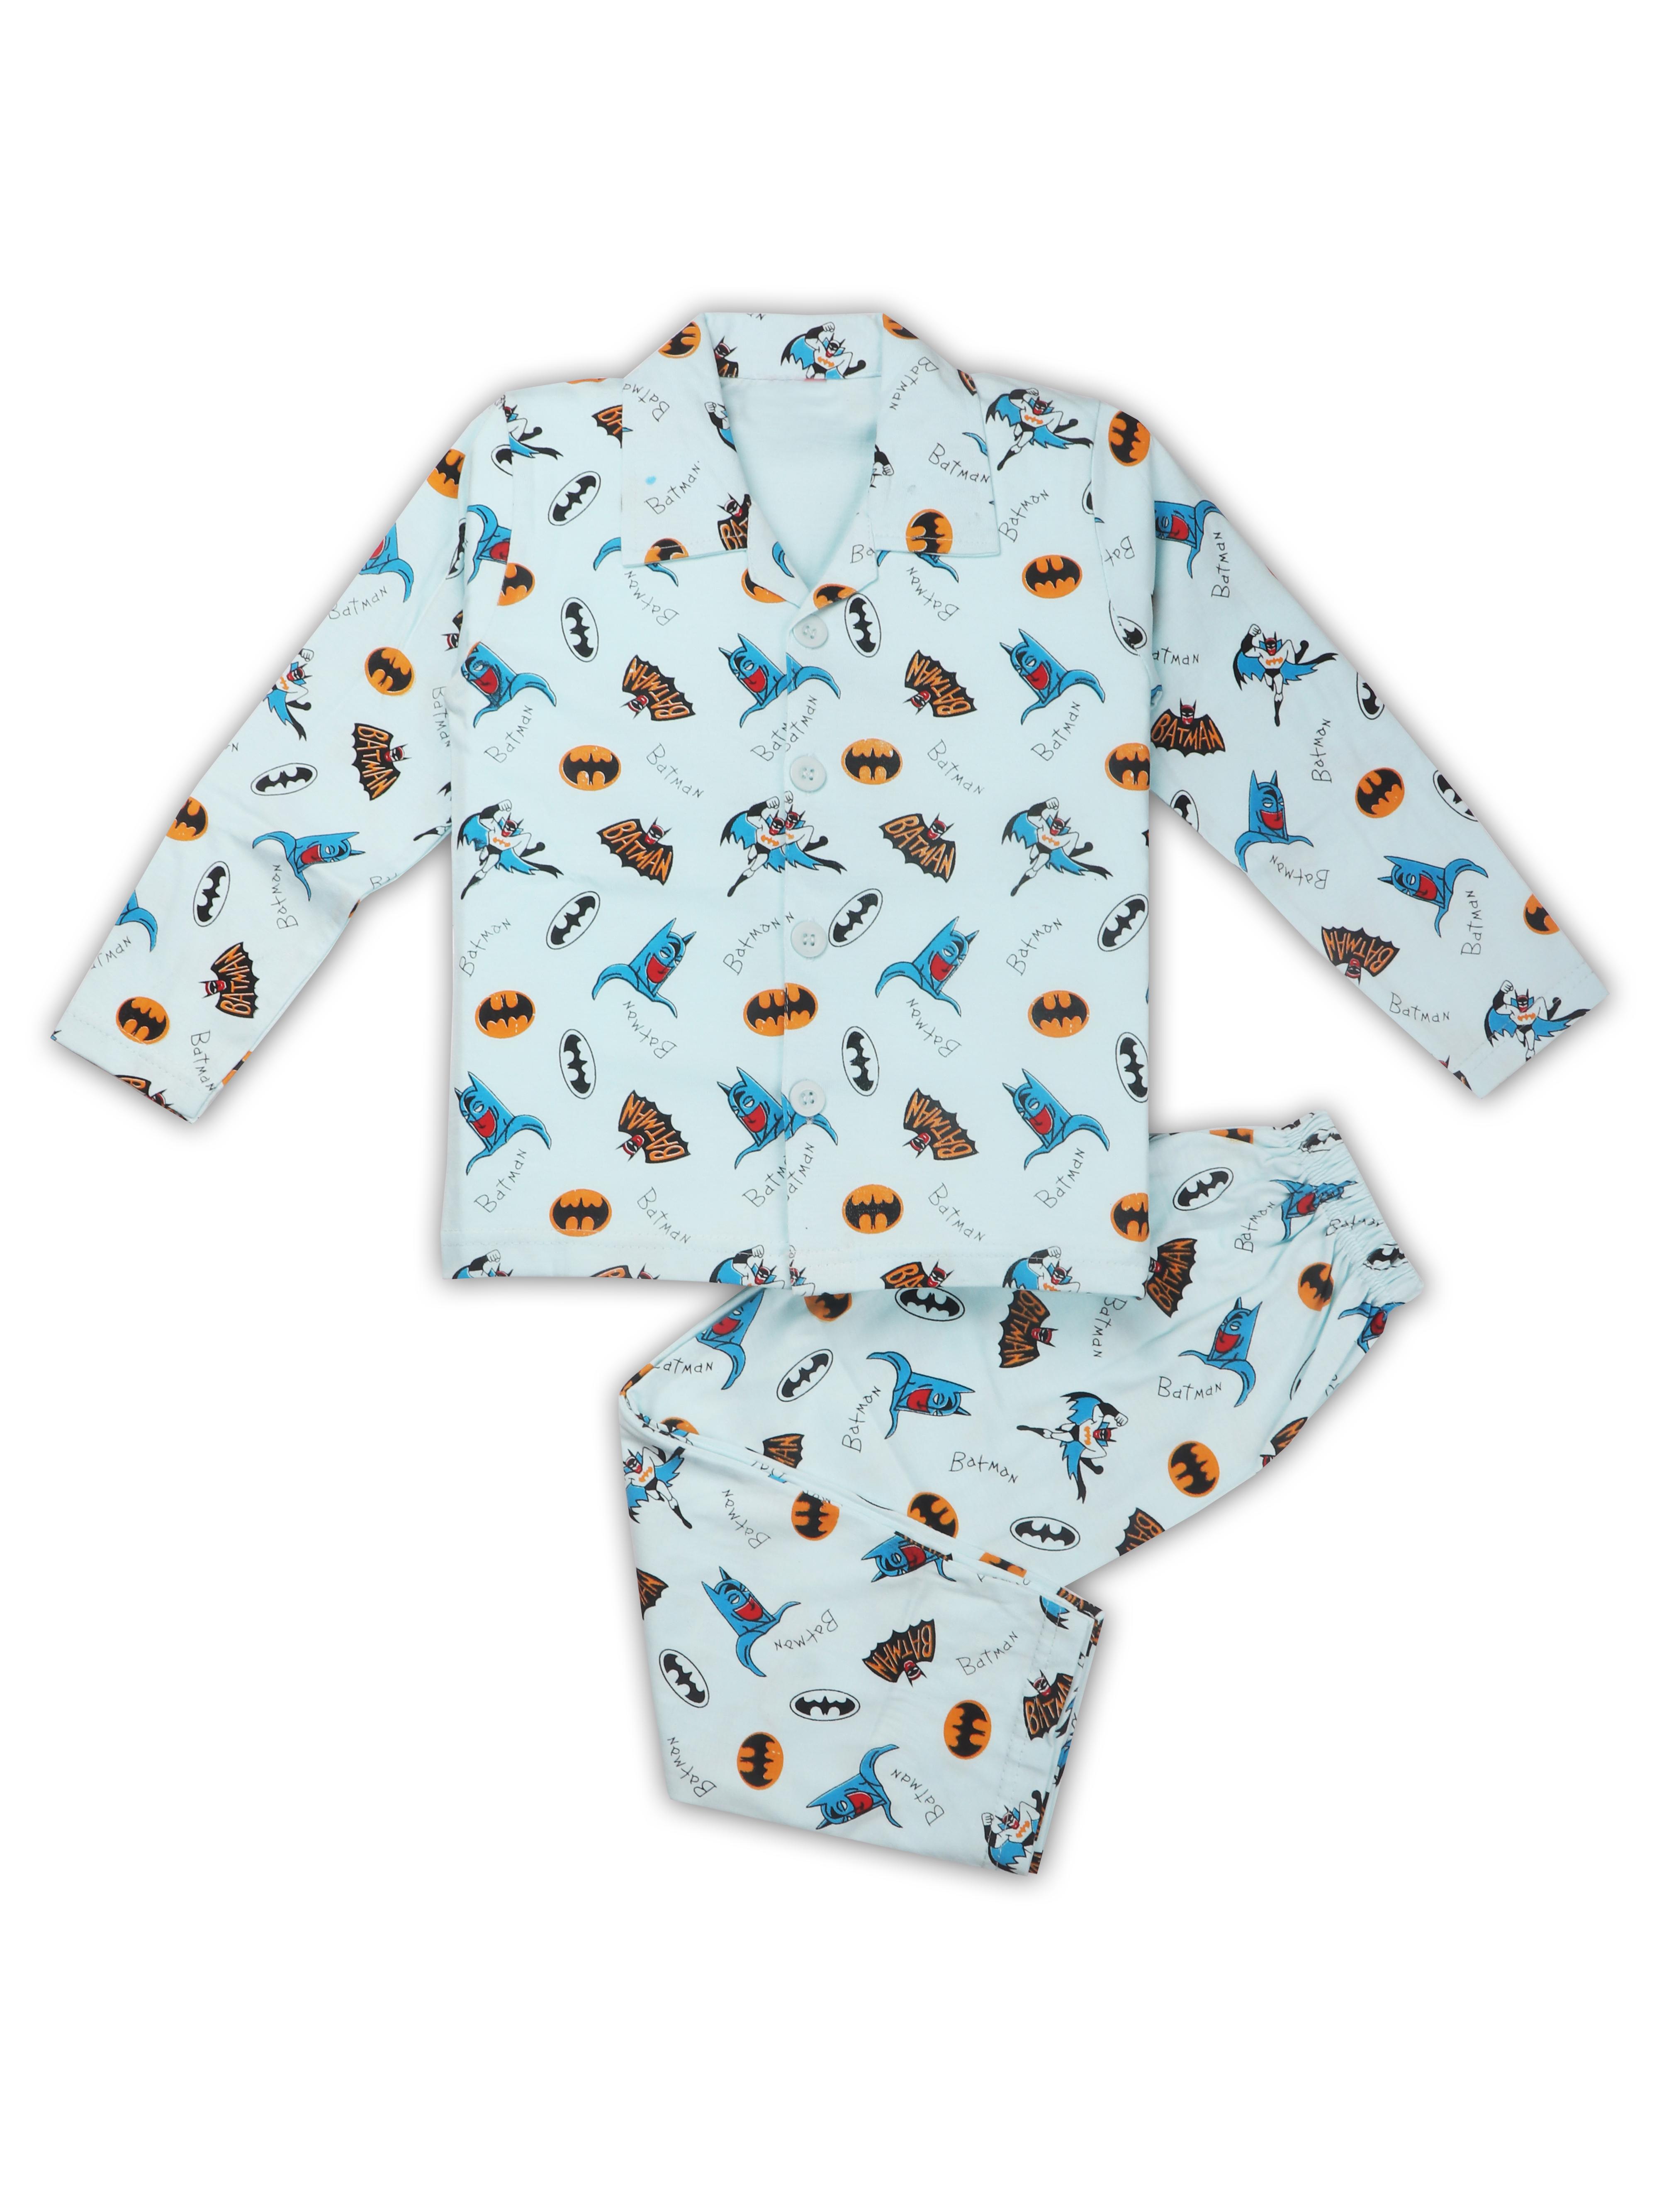 AAAKAR | AAAKAR Full Sleeves NightSuit Batman Print - Blue